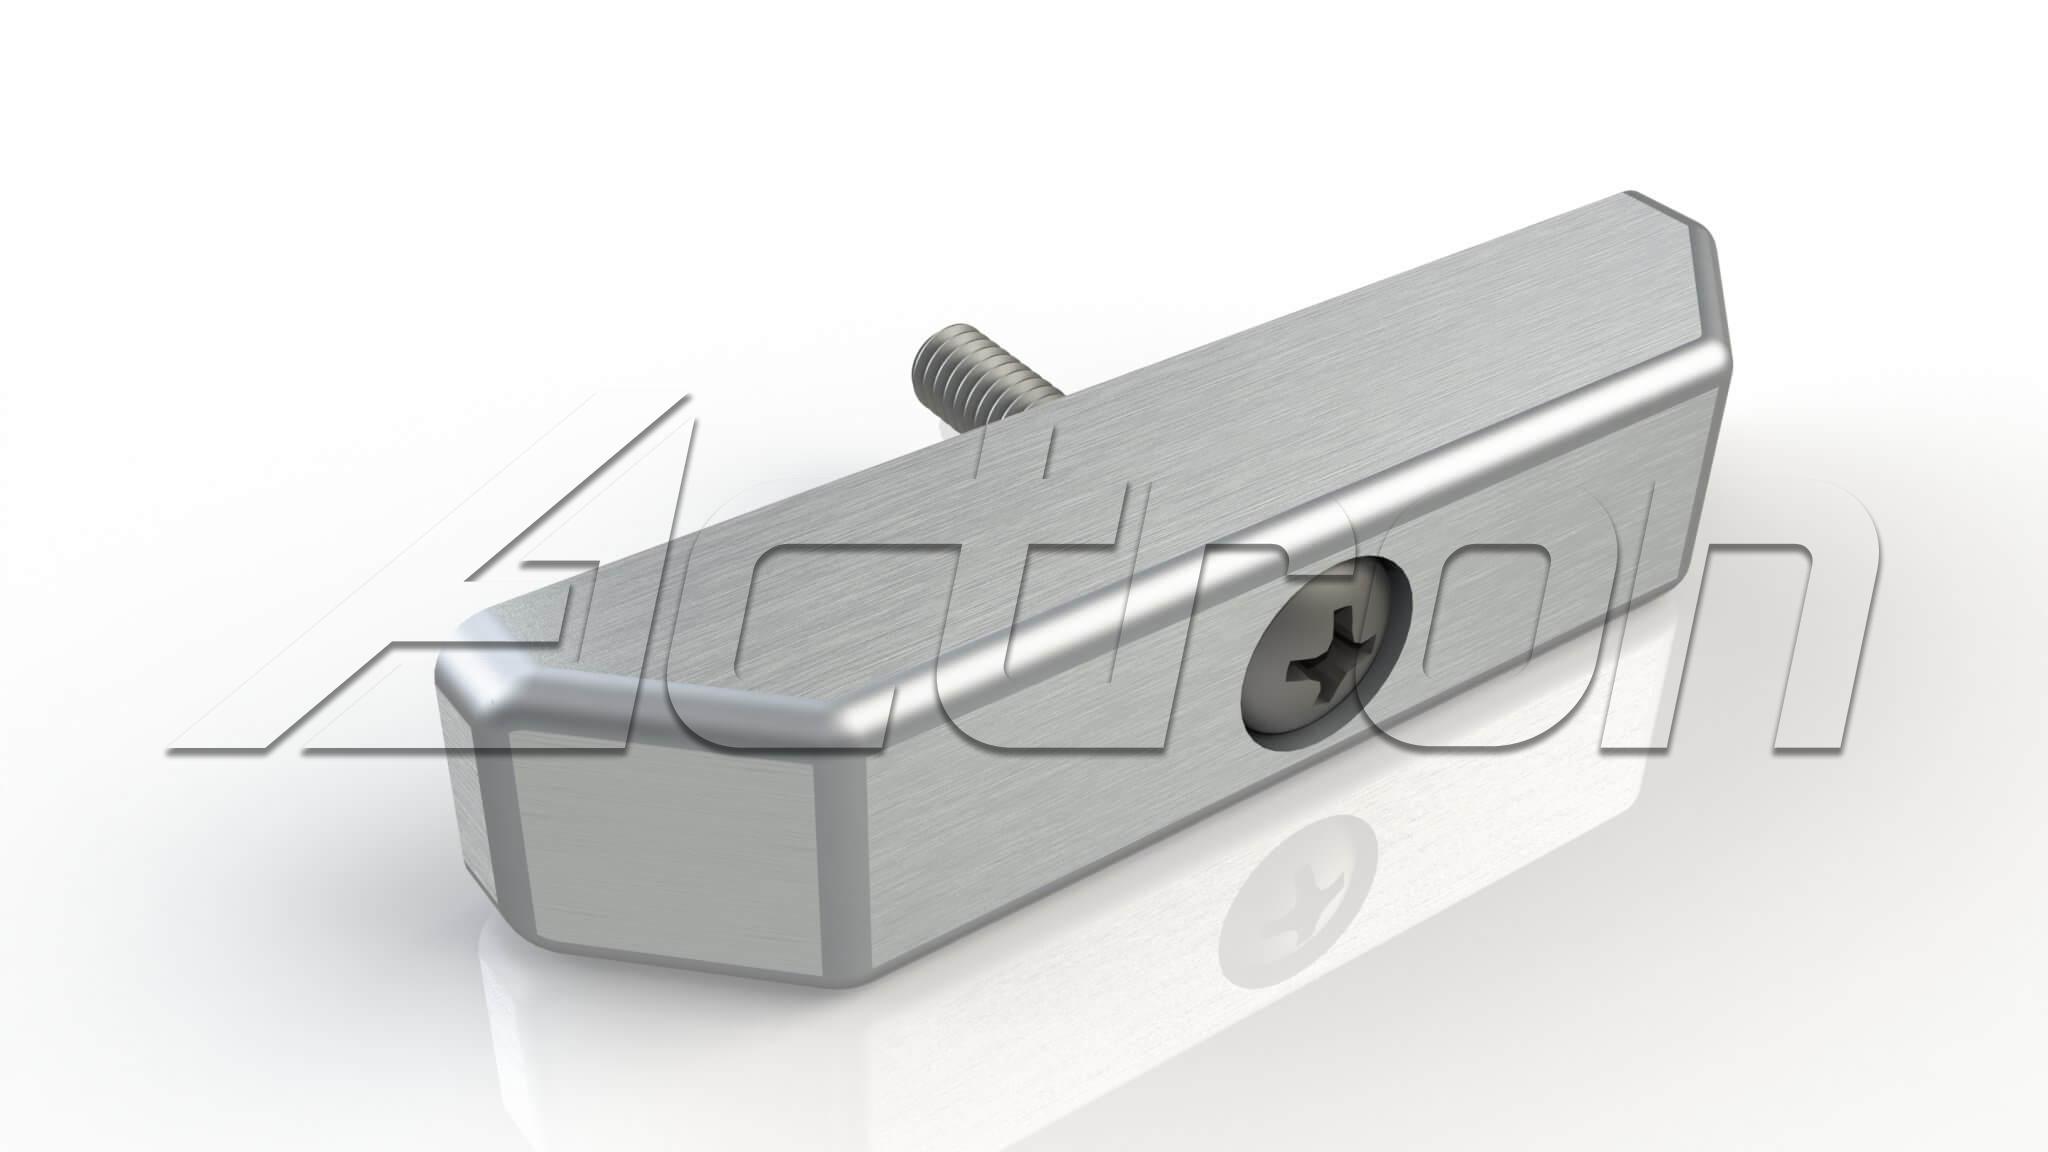 1-4-turn-retainer-4805-a35586.jpg